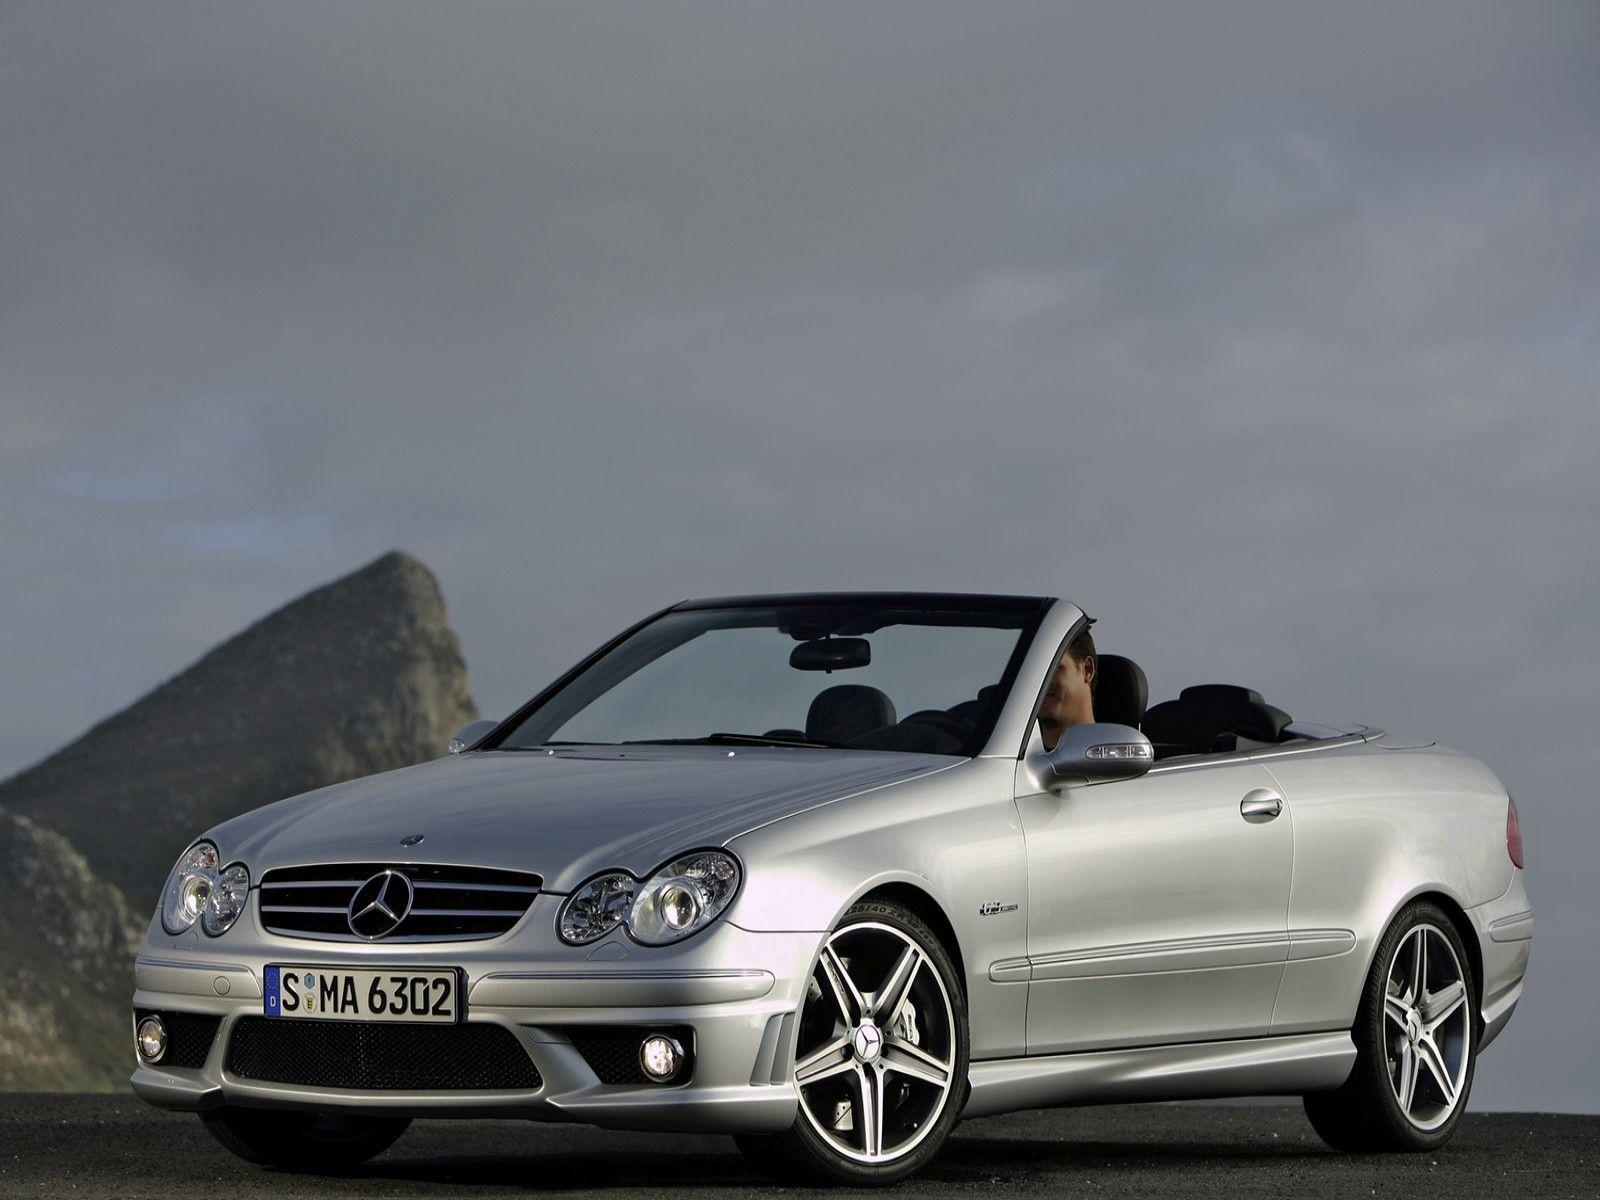 Mercedes Clk Convertible Mercedes Benz Mercedes Convertible Benz